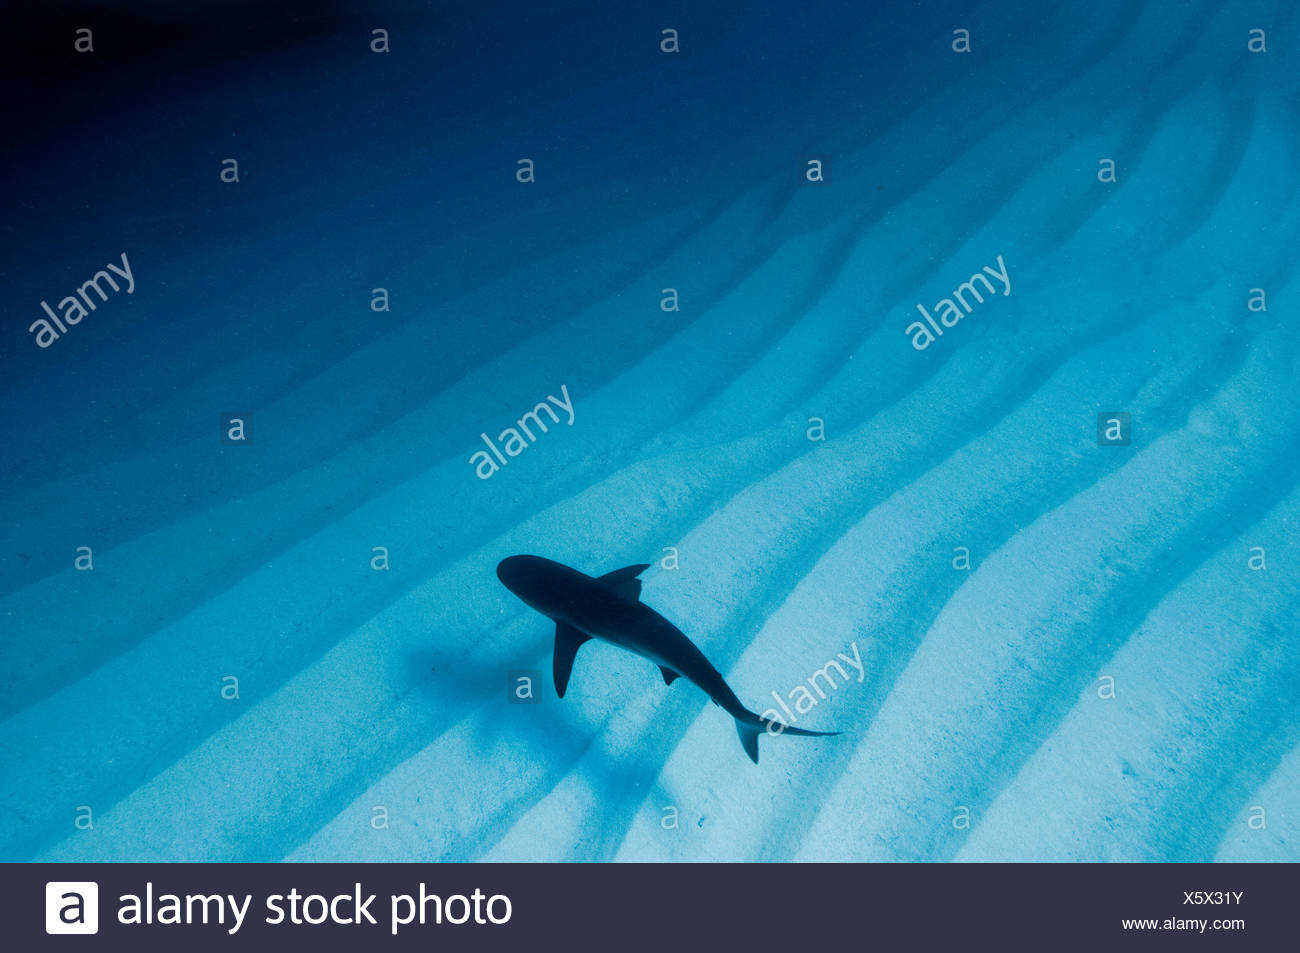 Una luce disponibile foto di una barriera corallina caraibica shark (Carcharhinus perezi) su sabbia increspature. Walkers Cay, Bahamas. Tropicali West Oceano Atlantico. Immagini Stock